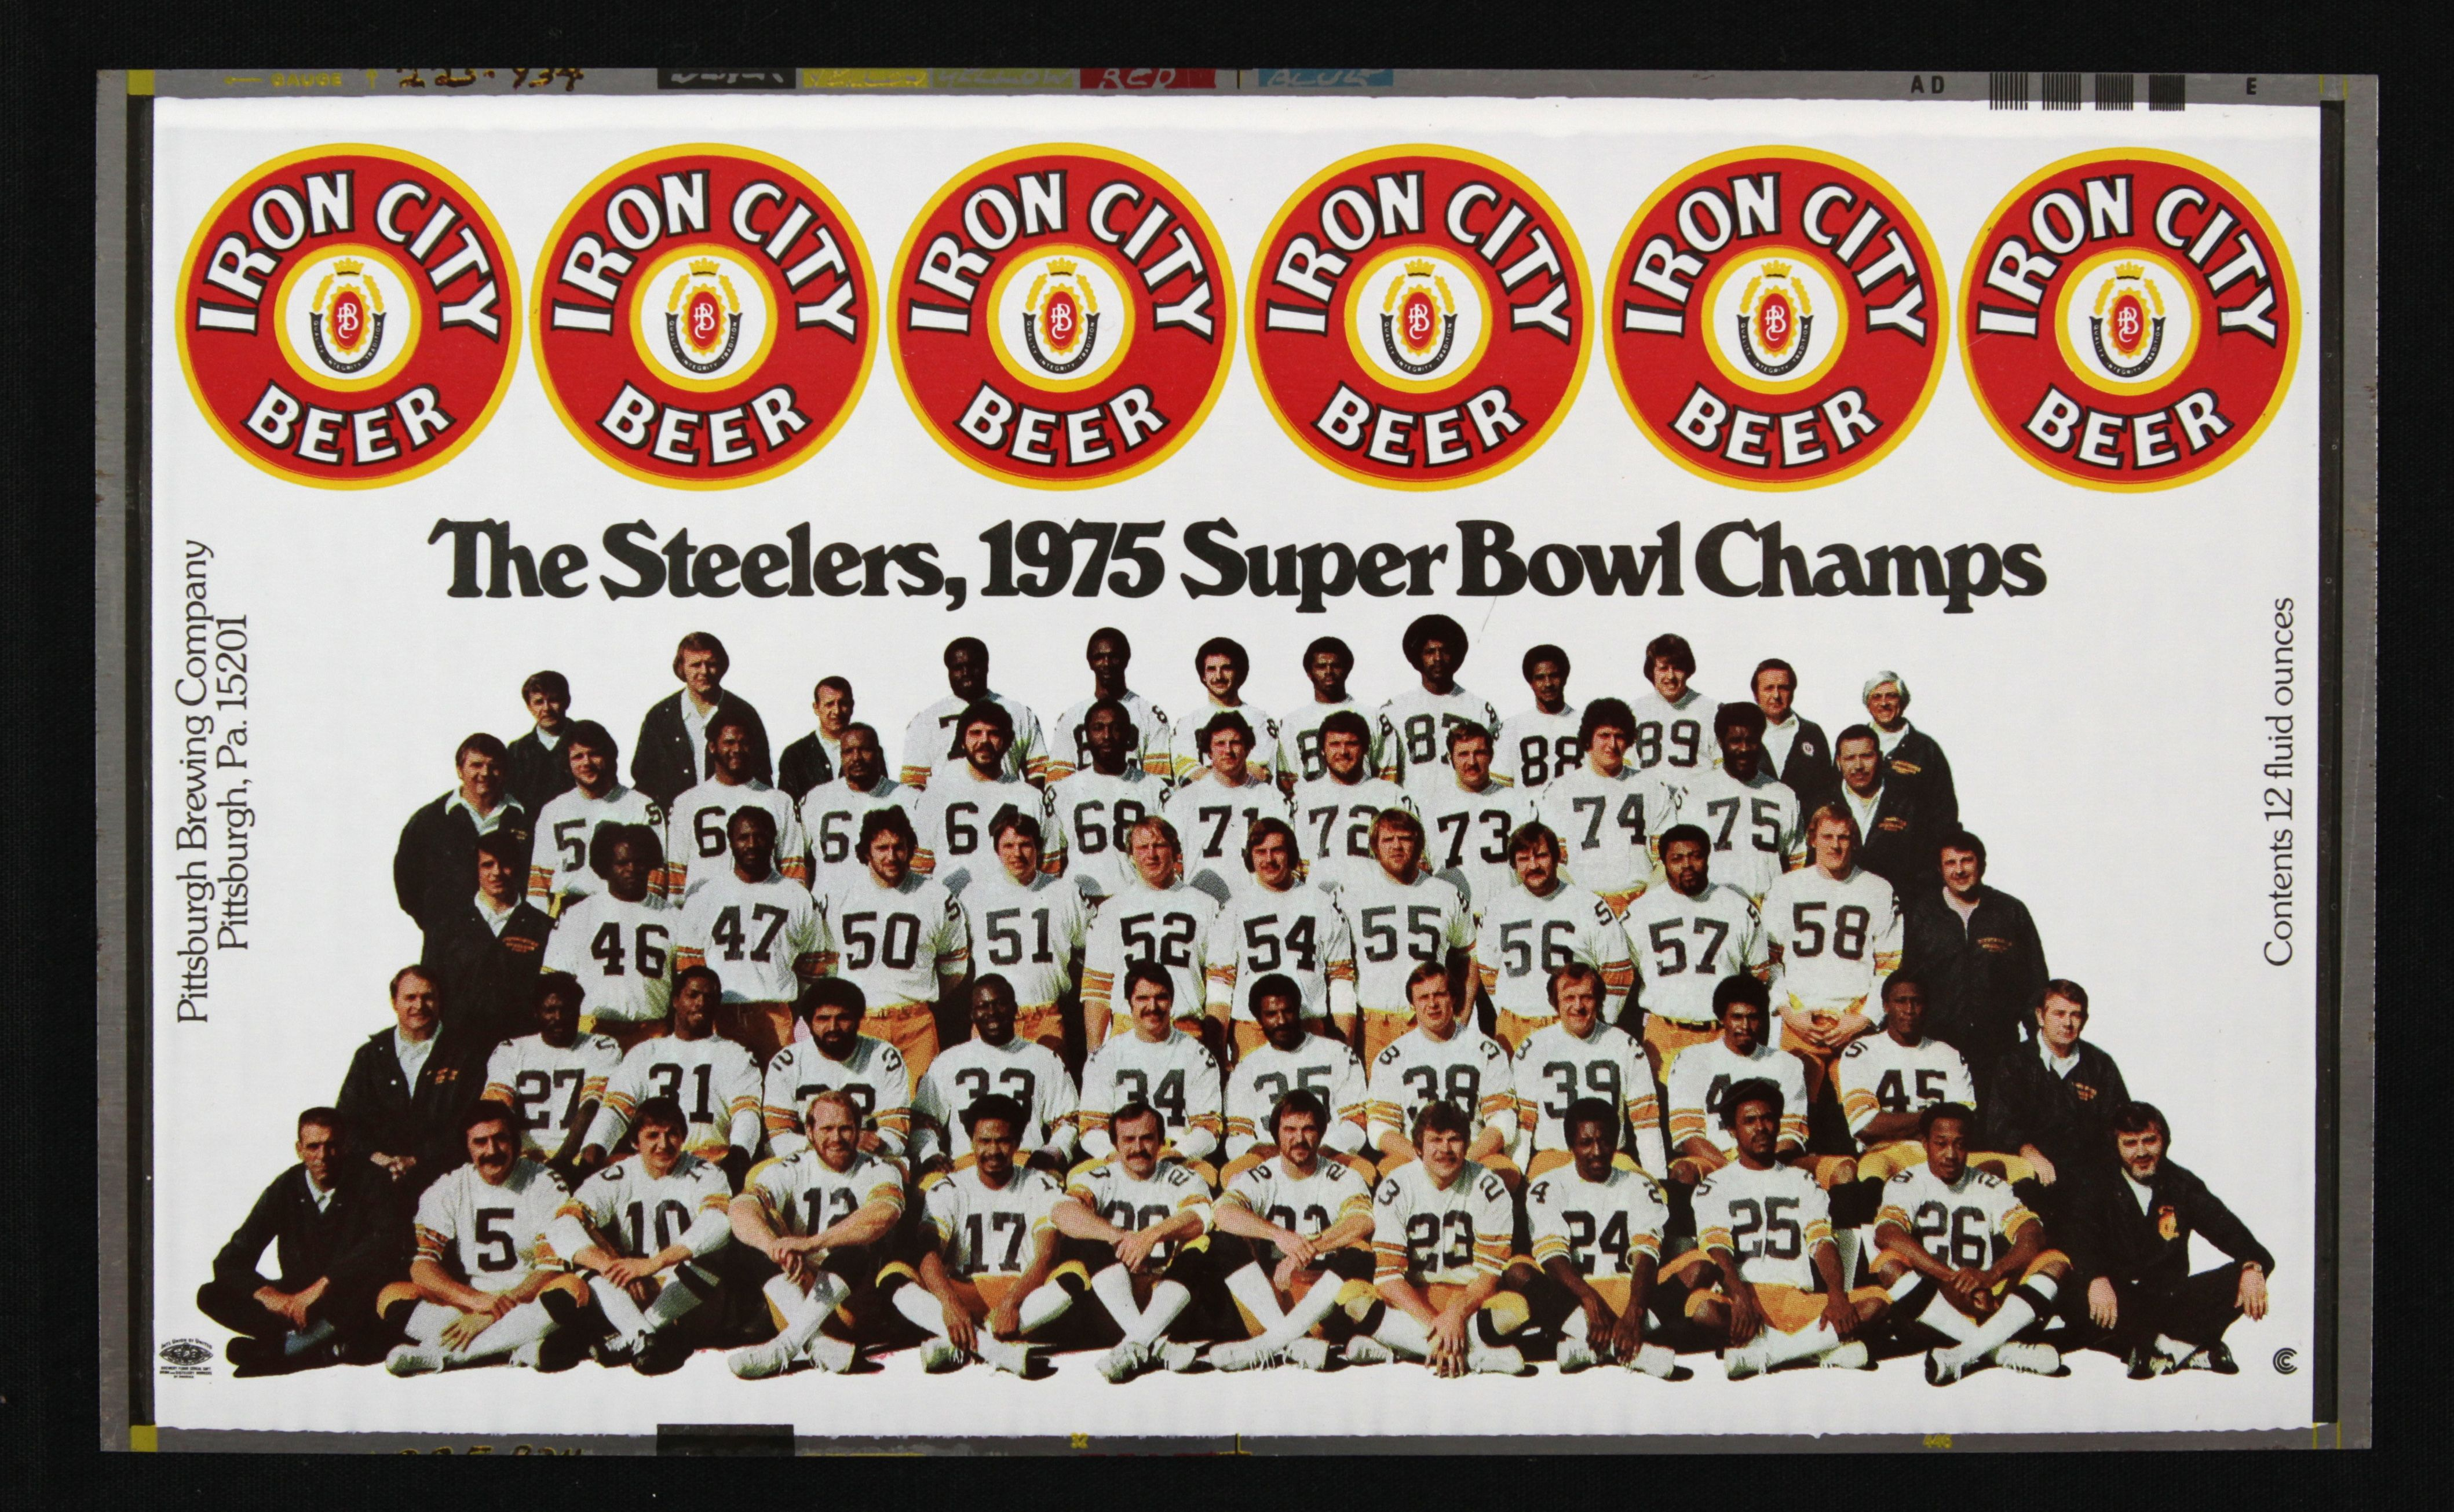 1975 steelers